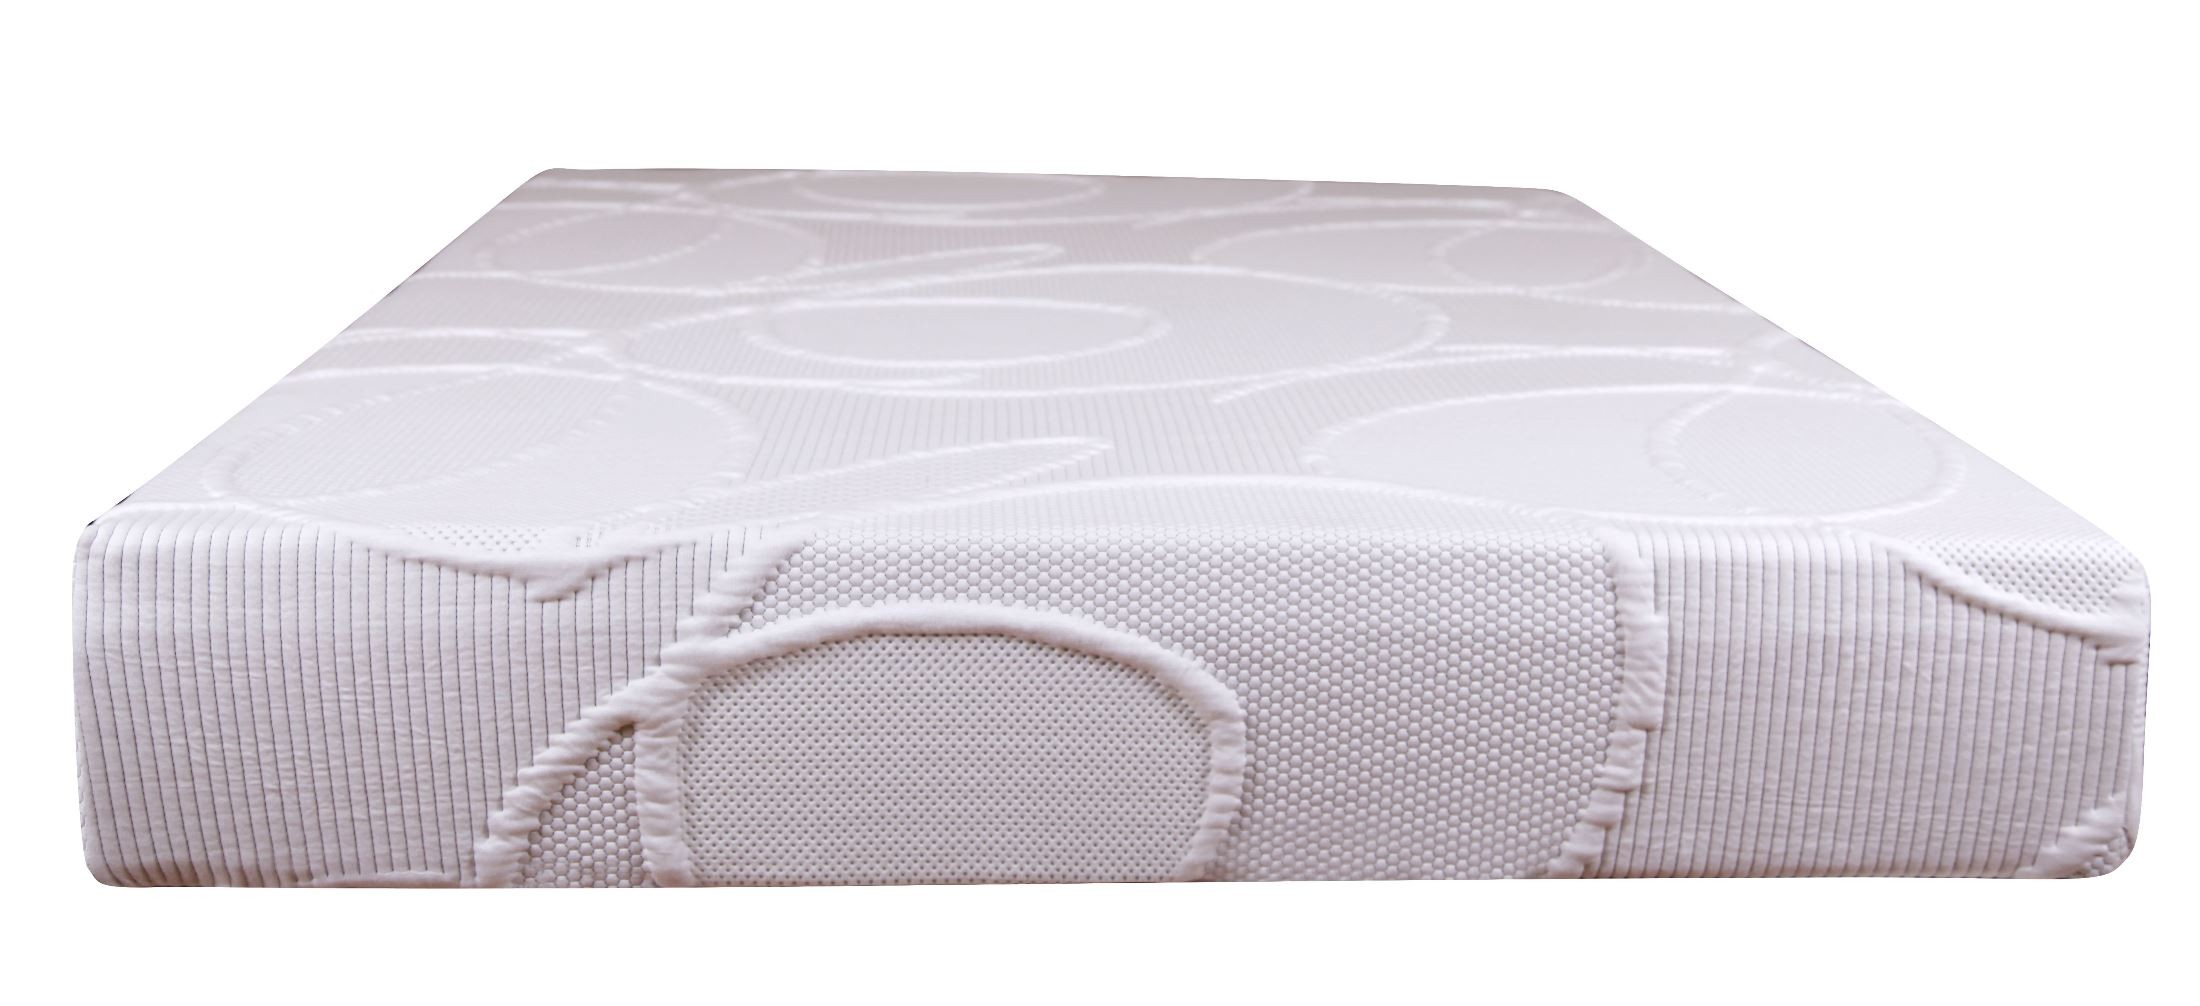 polaris 10 memory foam xl twin size mattress from klaussner polaristxtmat coleman furniture. Black Bedroom Furniture Sets. Home Design Ideas